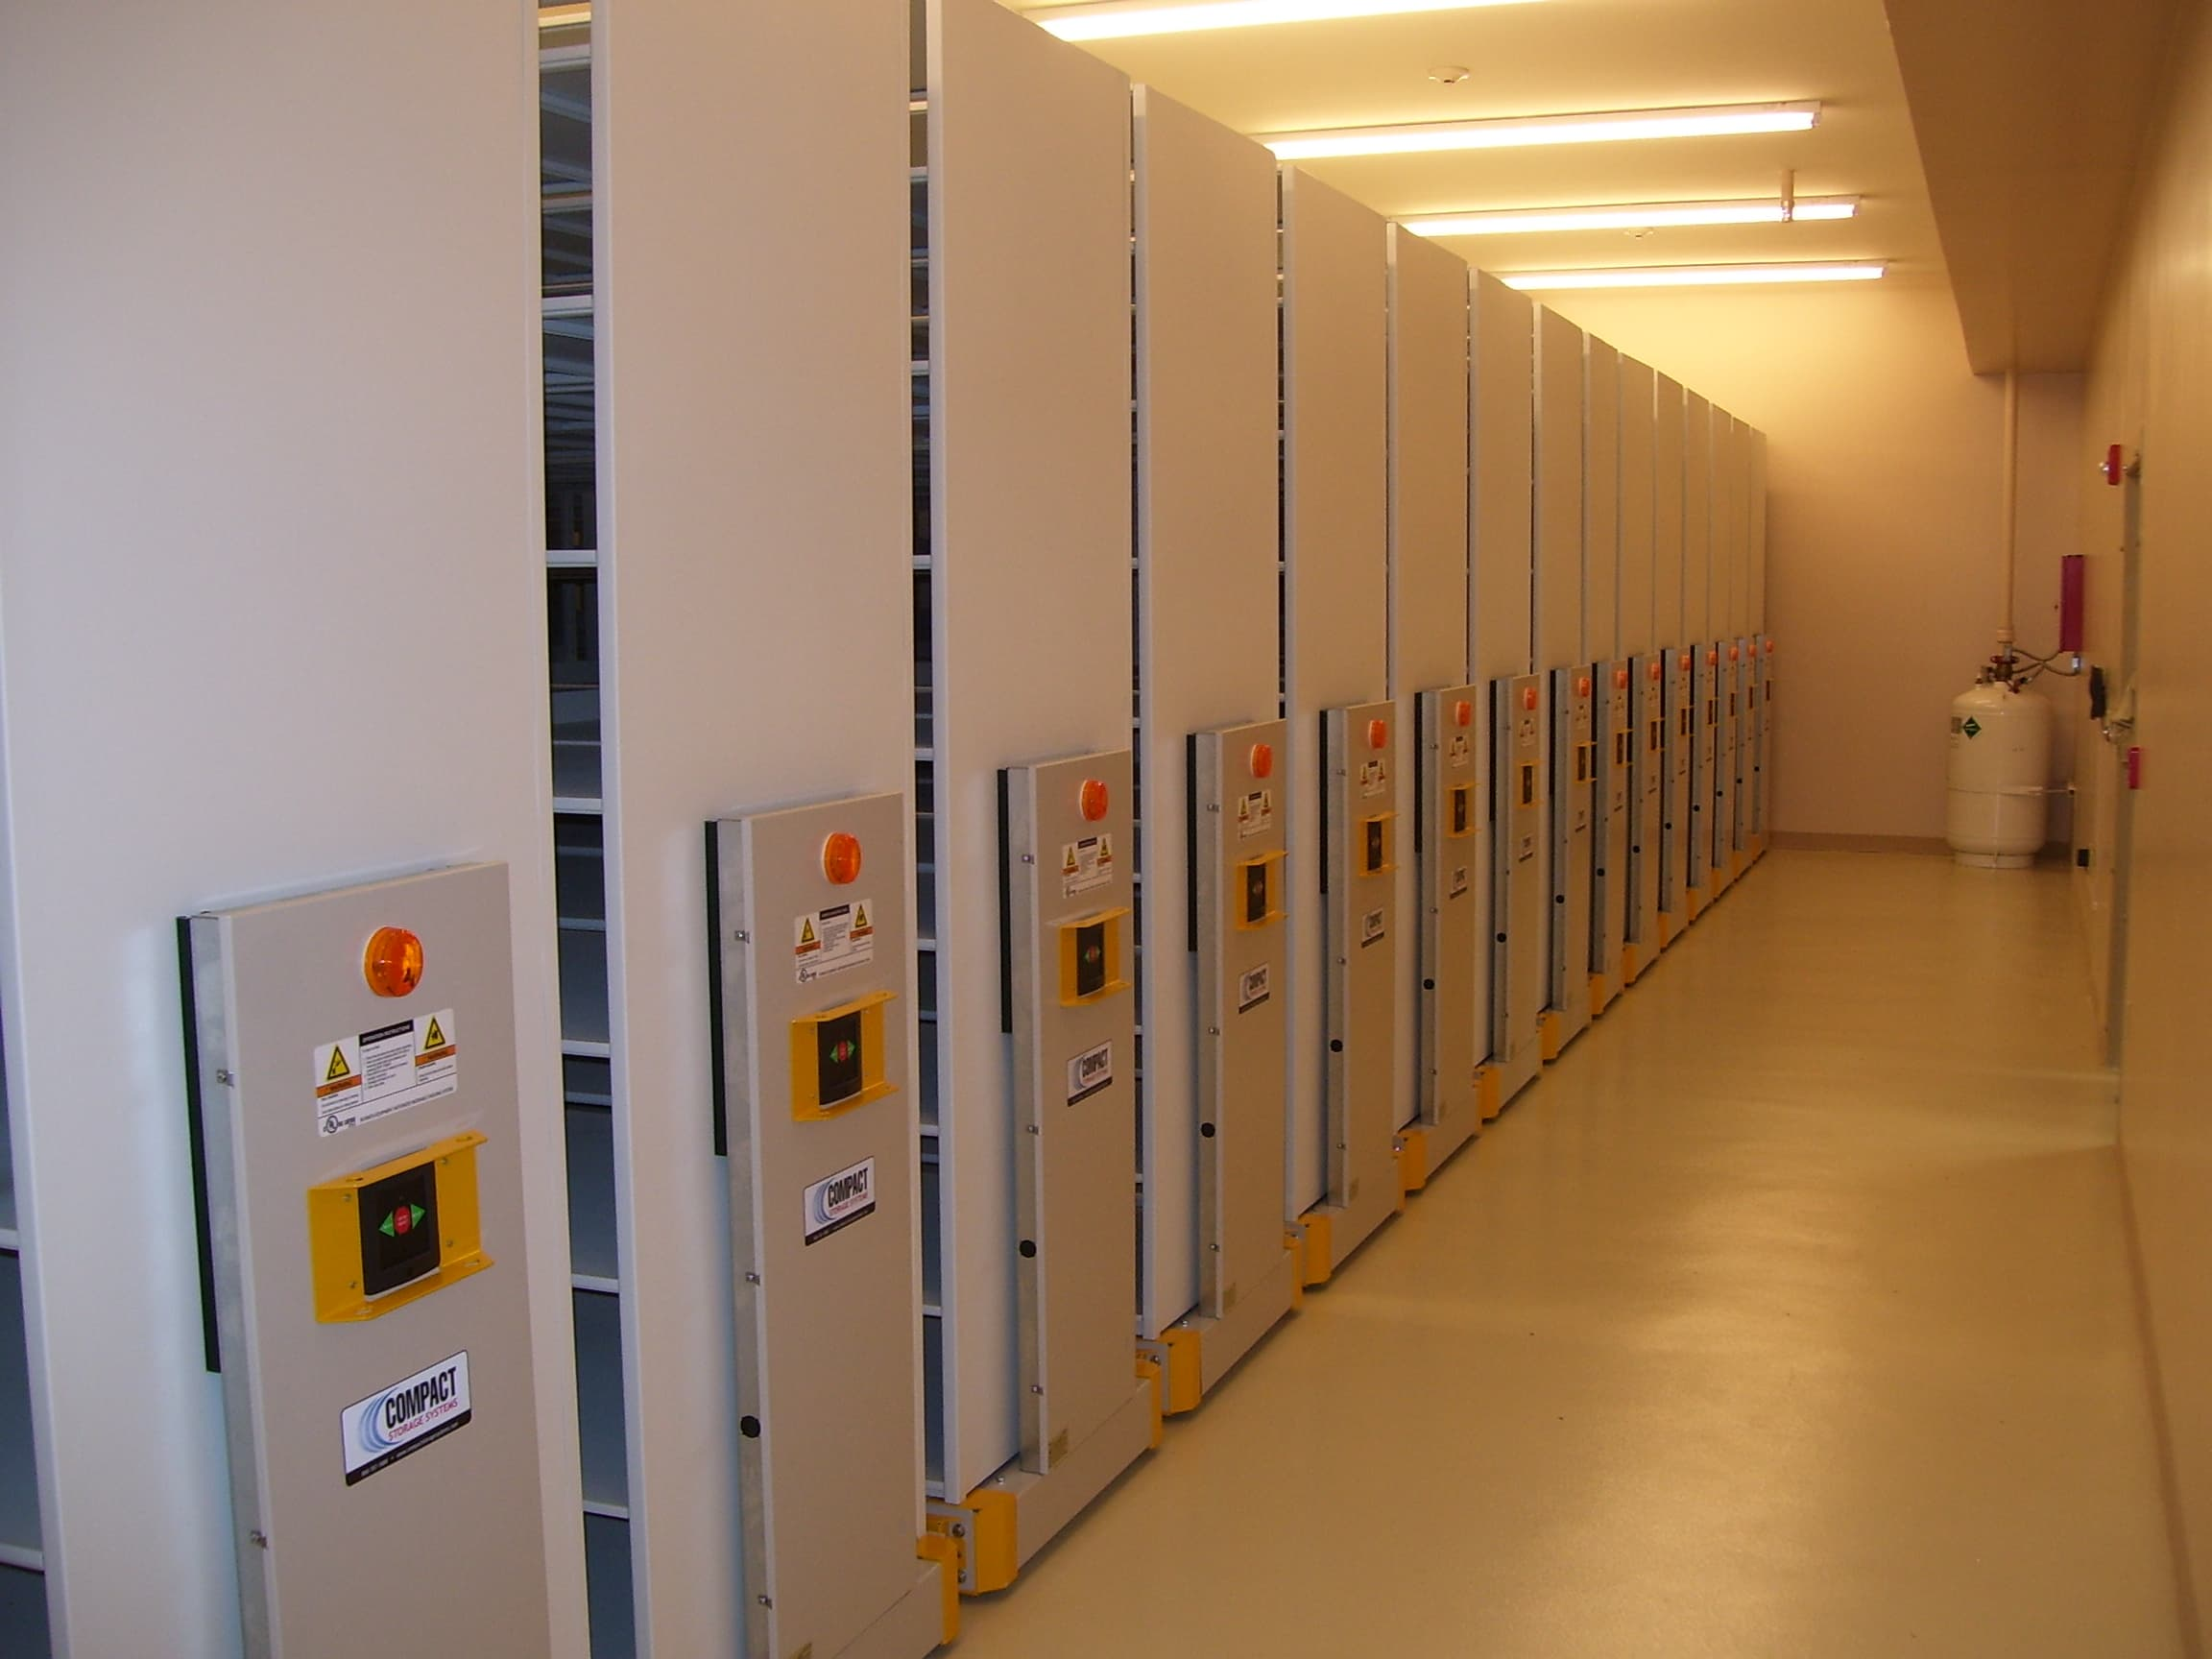 Powhatan Archival Vault